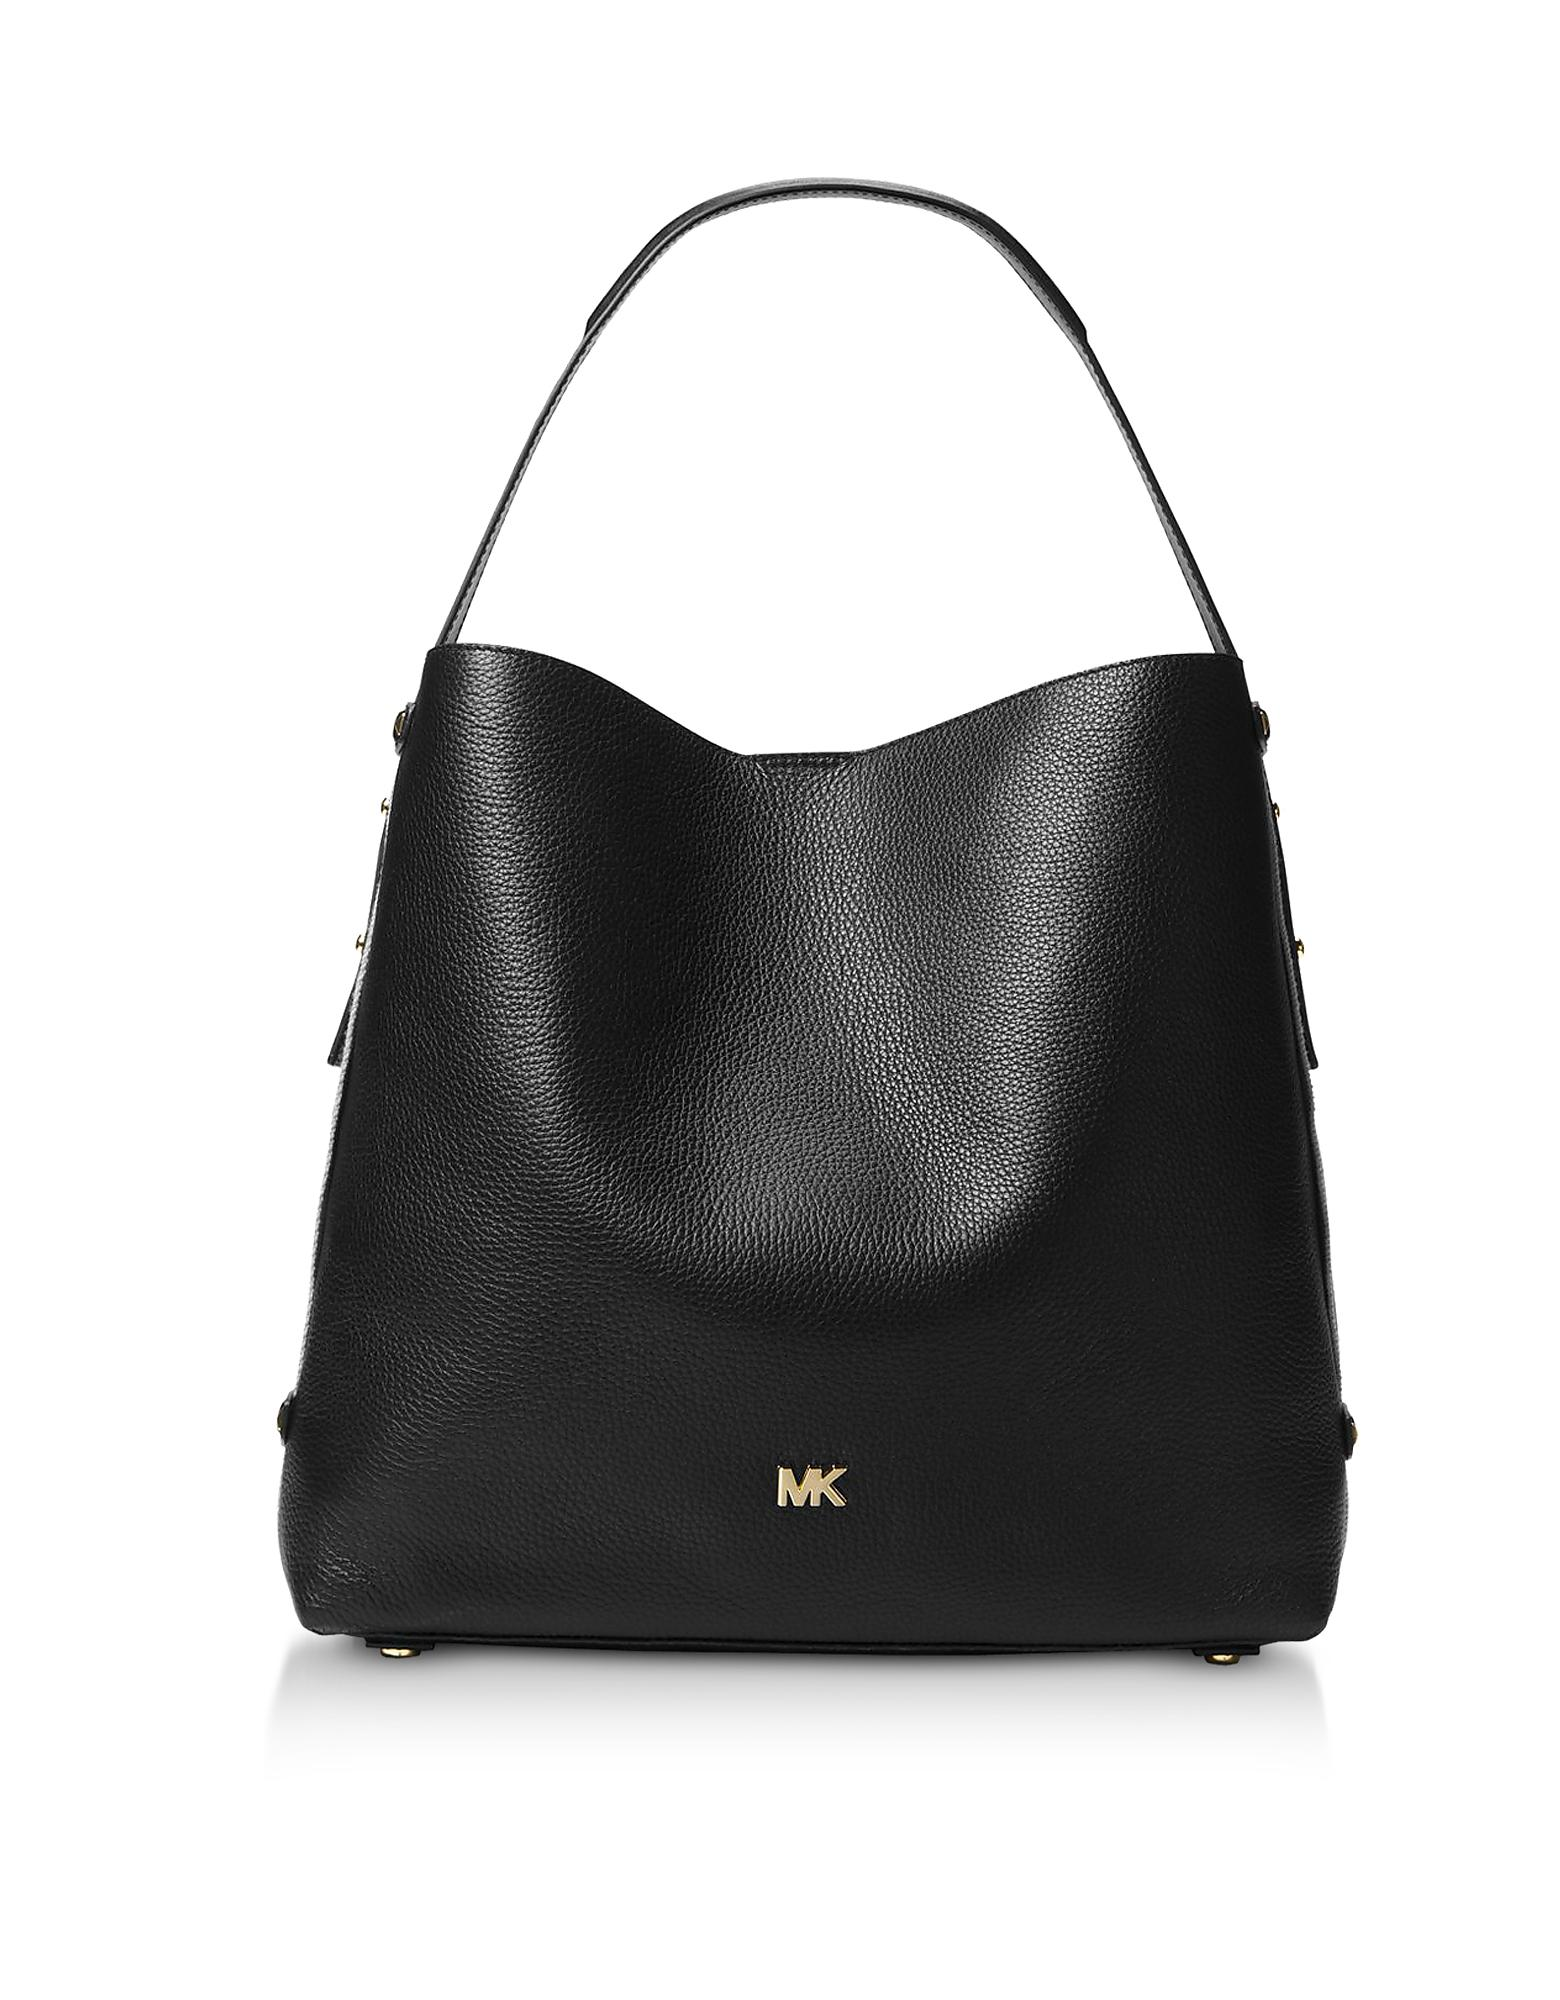 b89fdd606b3e Lyst - Michael Kors Griffin Large Leather Shoulder Bag in Black